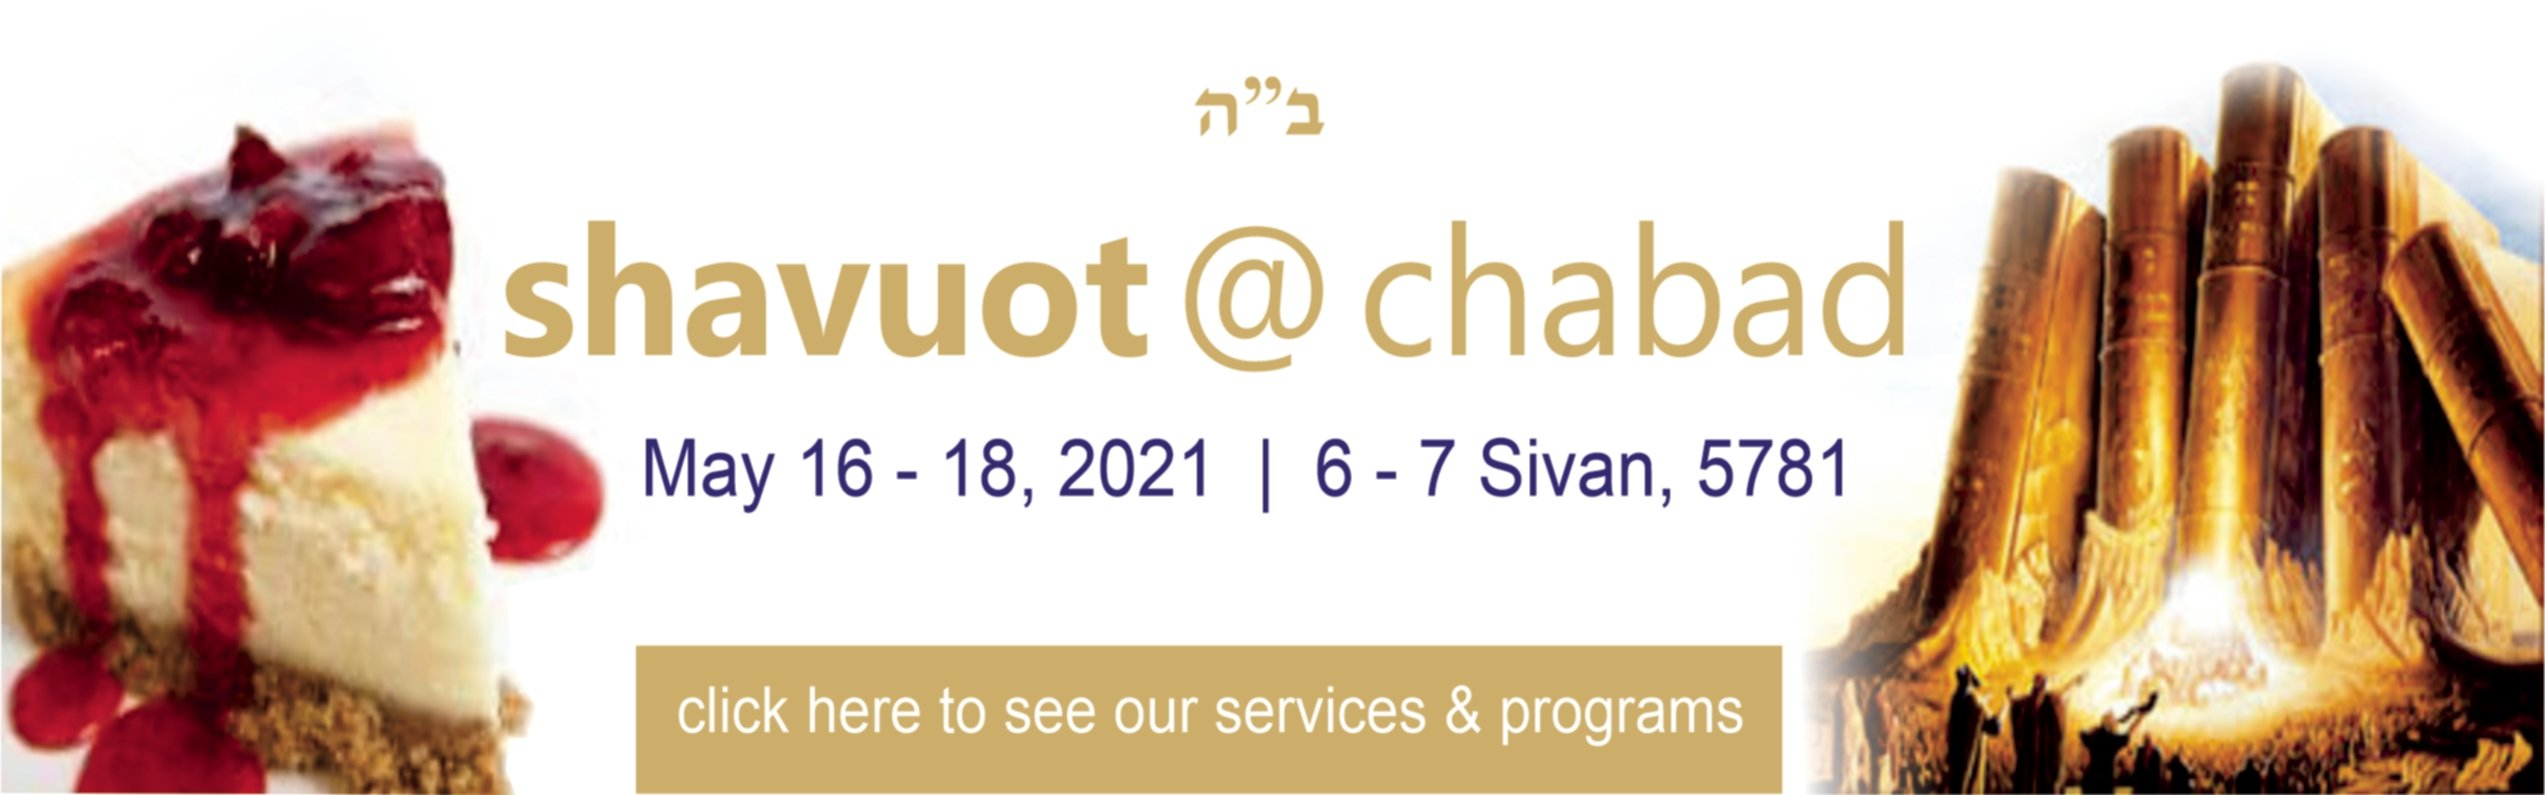 shavuos banner 2019.jpg